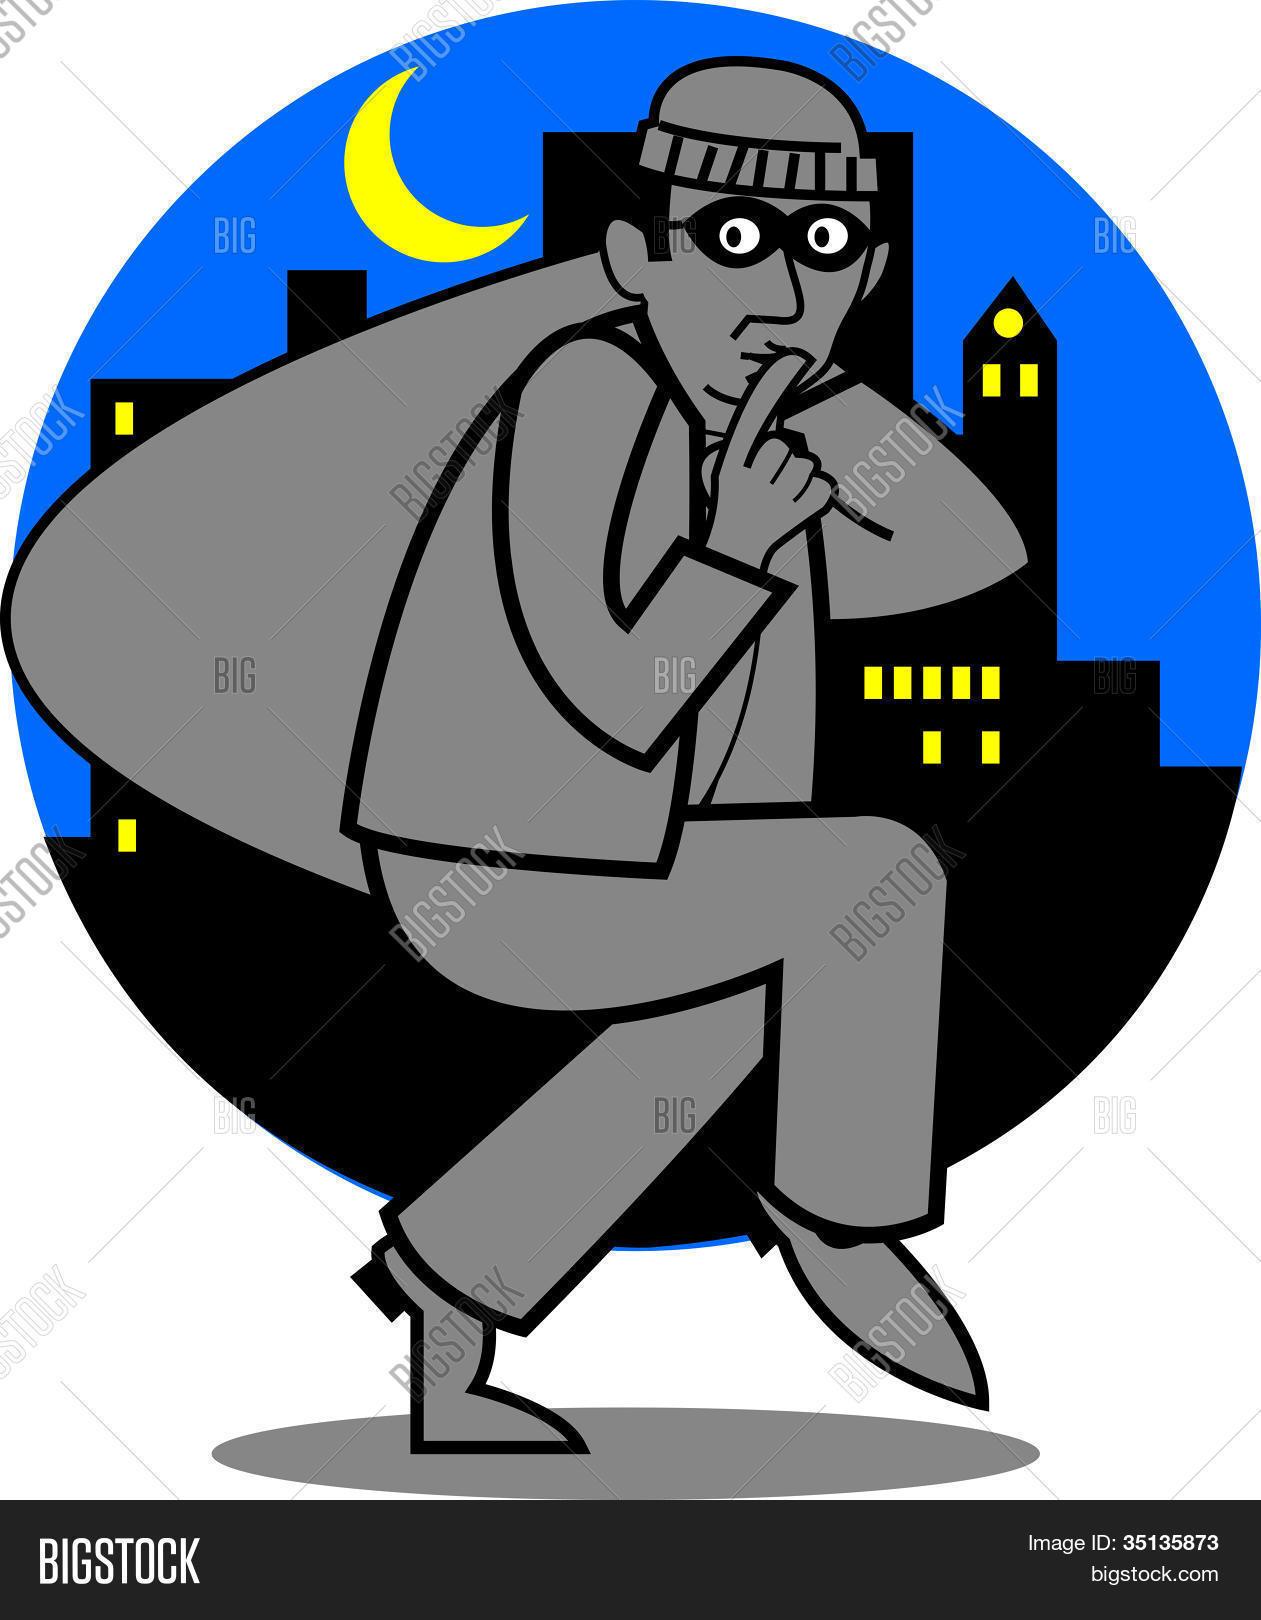 burglar clip art vector photo free trial bigstock rh bigstockphoto com burglar clipart burglary clip art